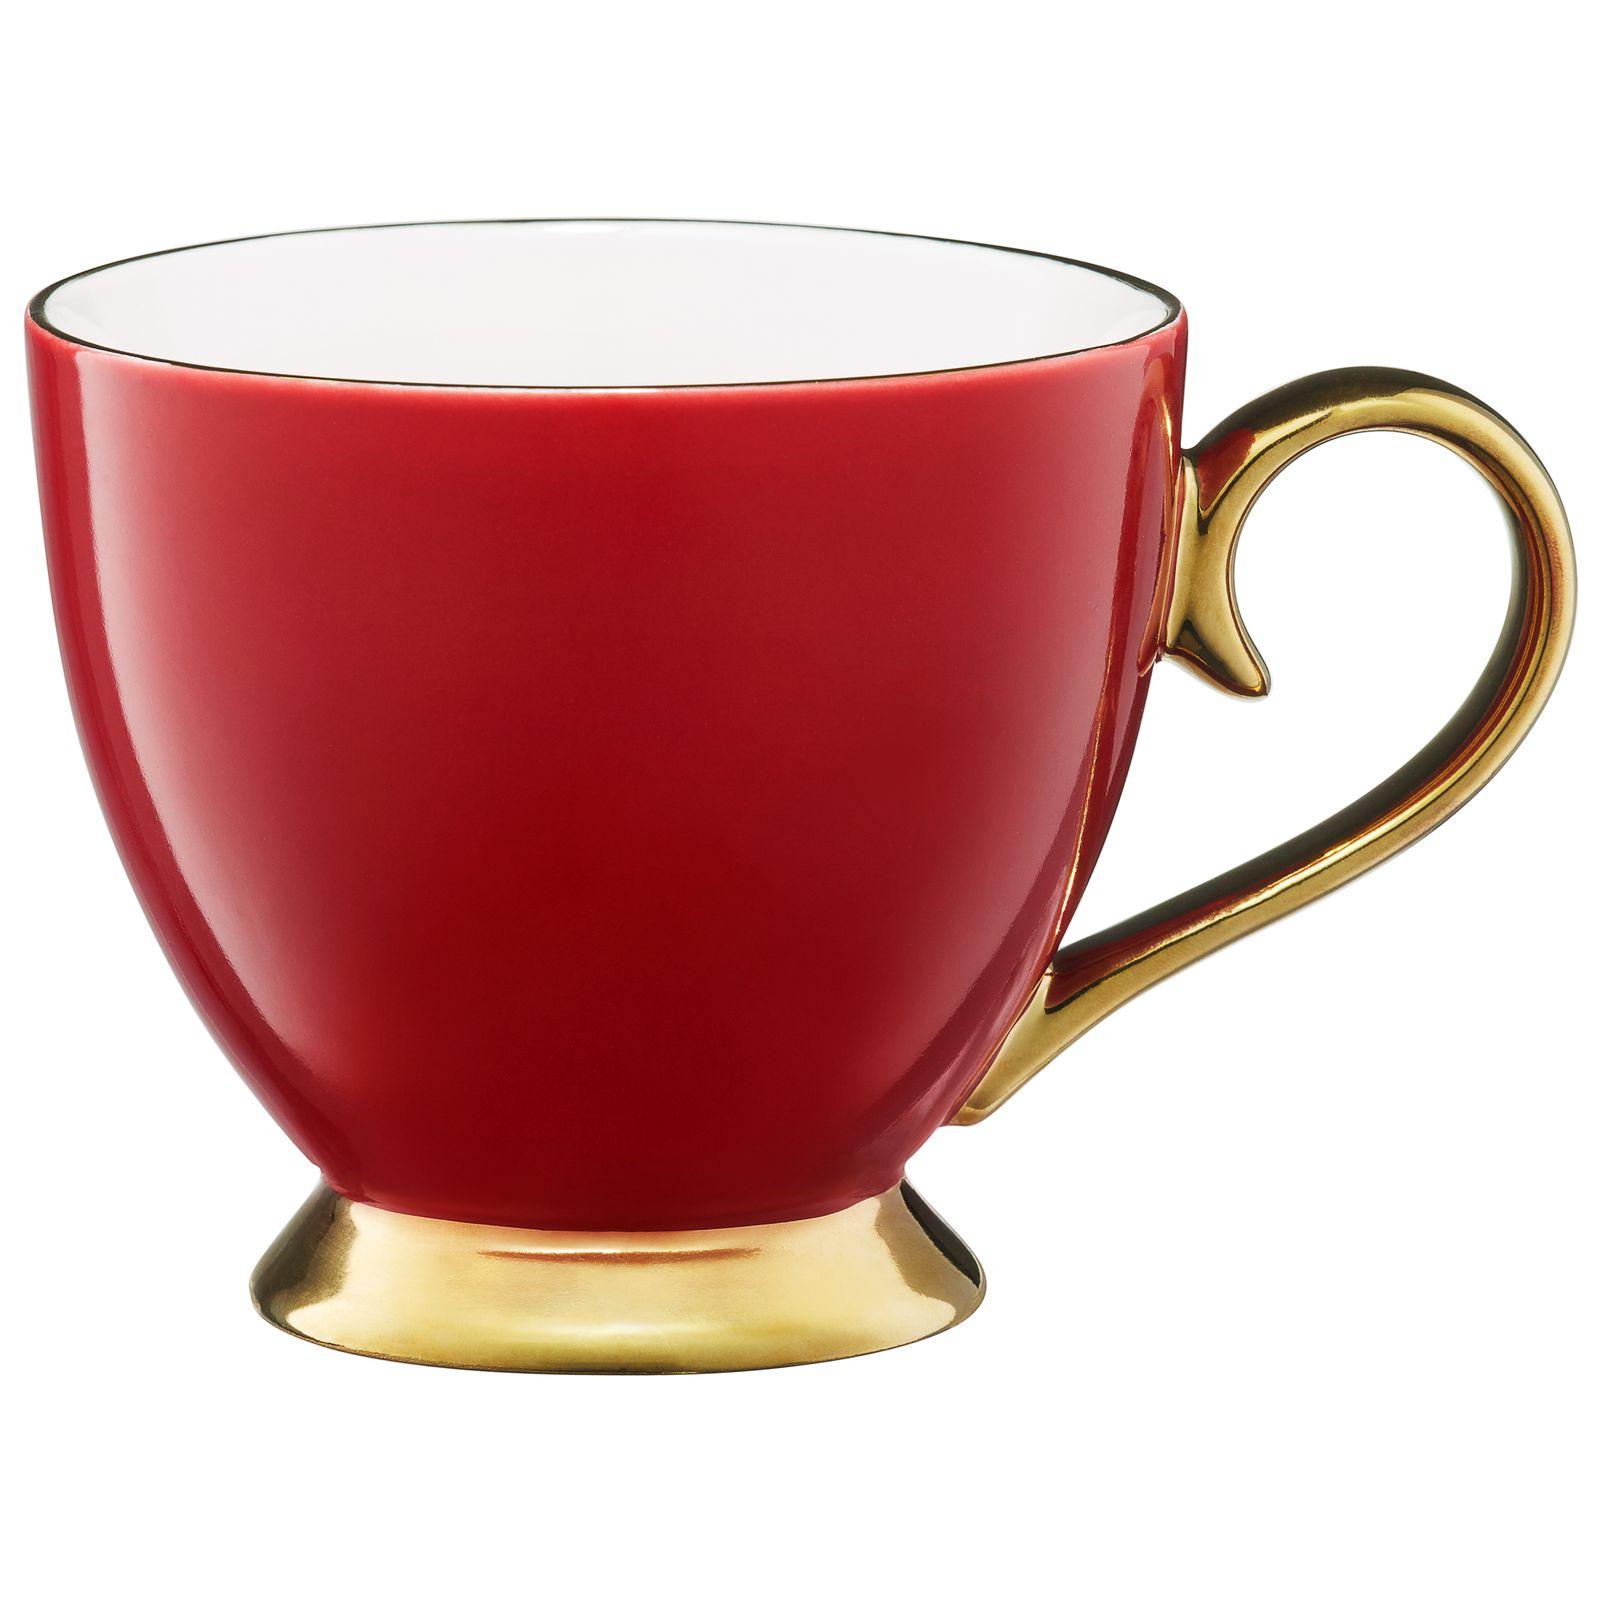 Kubek Royal 400 ml czerwono-złoty AMBITION